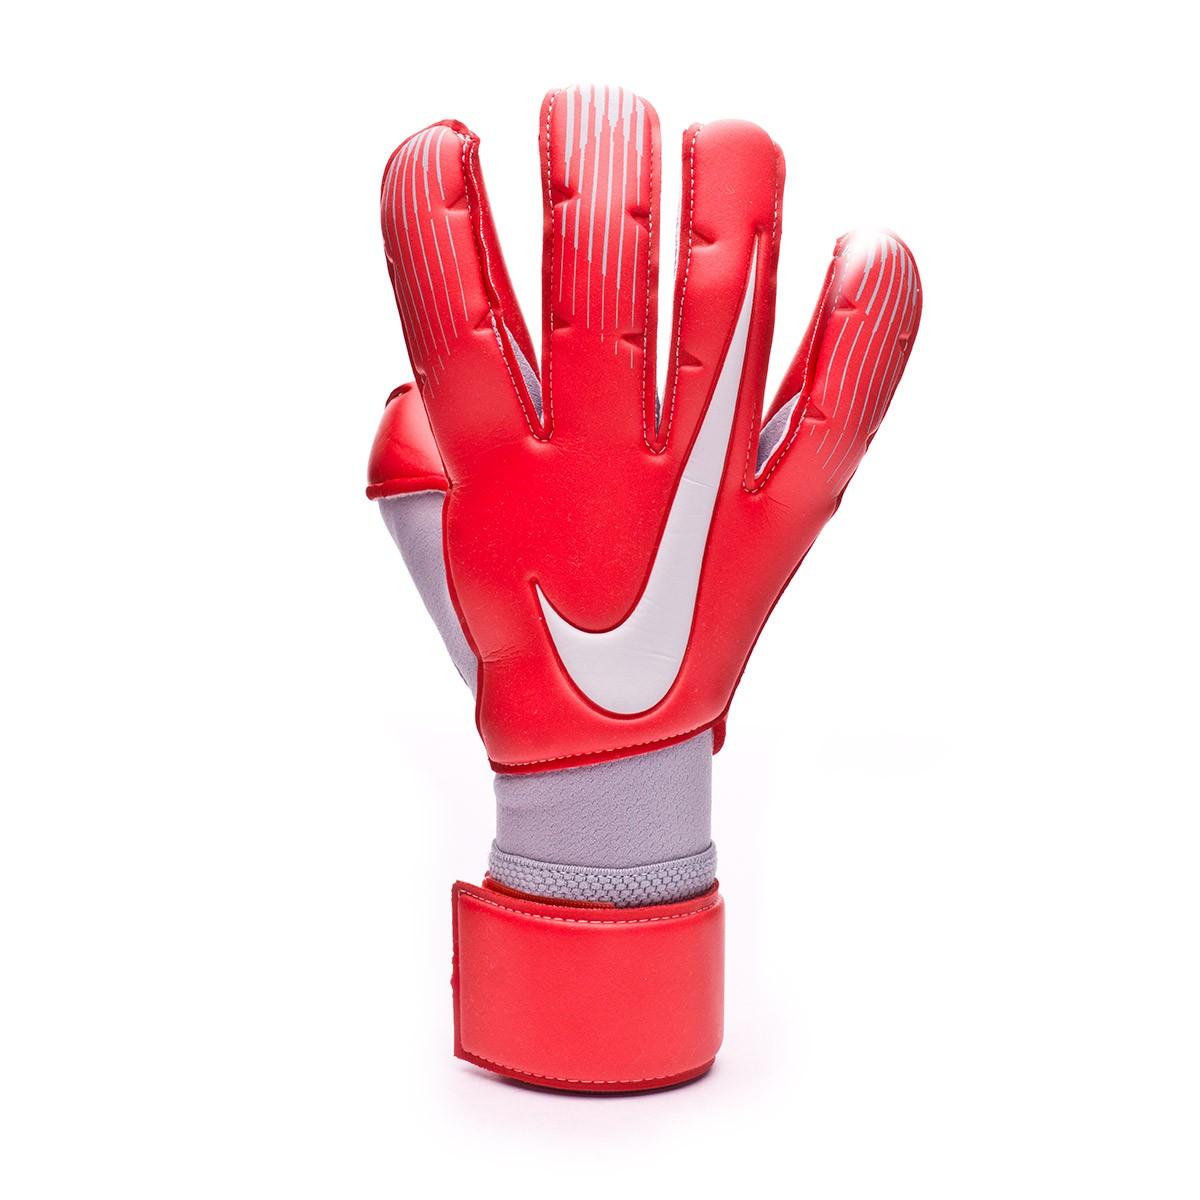 comida Tectónico límite  Glove Nike Vapor Grip 3 RS Promo Light crimson-Wolf grey-Pure platinum -  Football store Fútbol Emotion